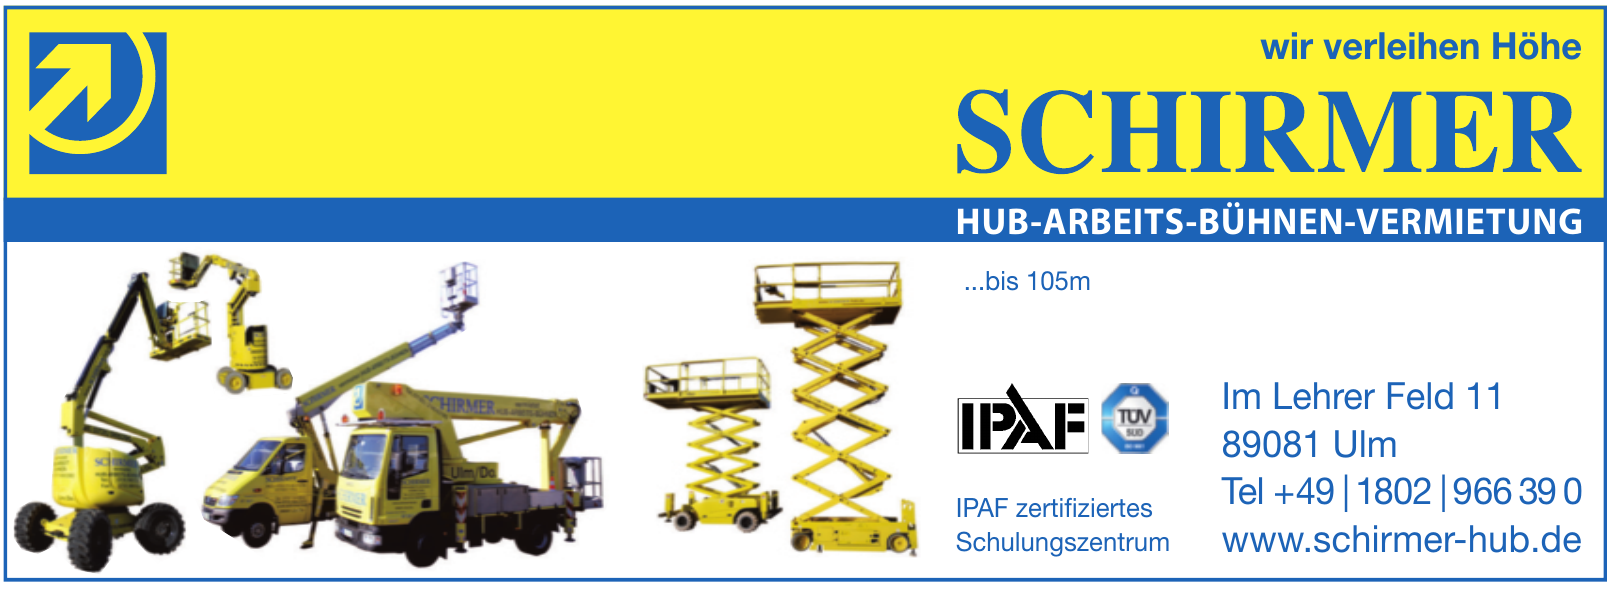 Schirmer GmbH & Co. KG